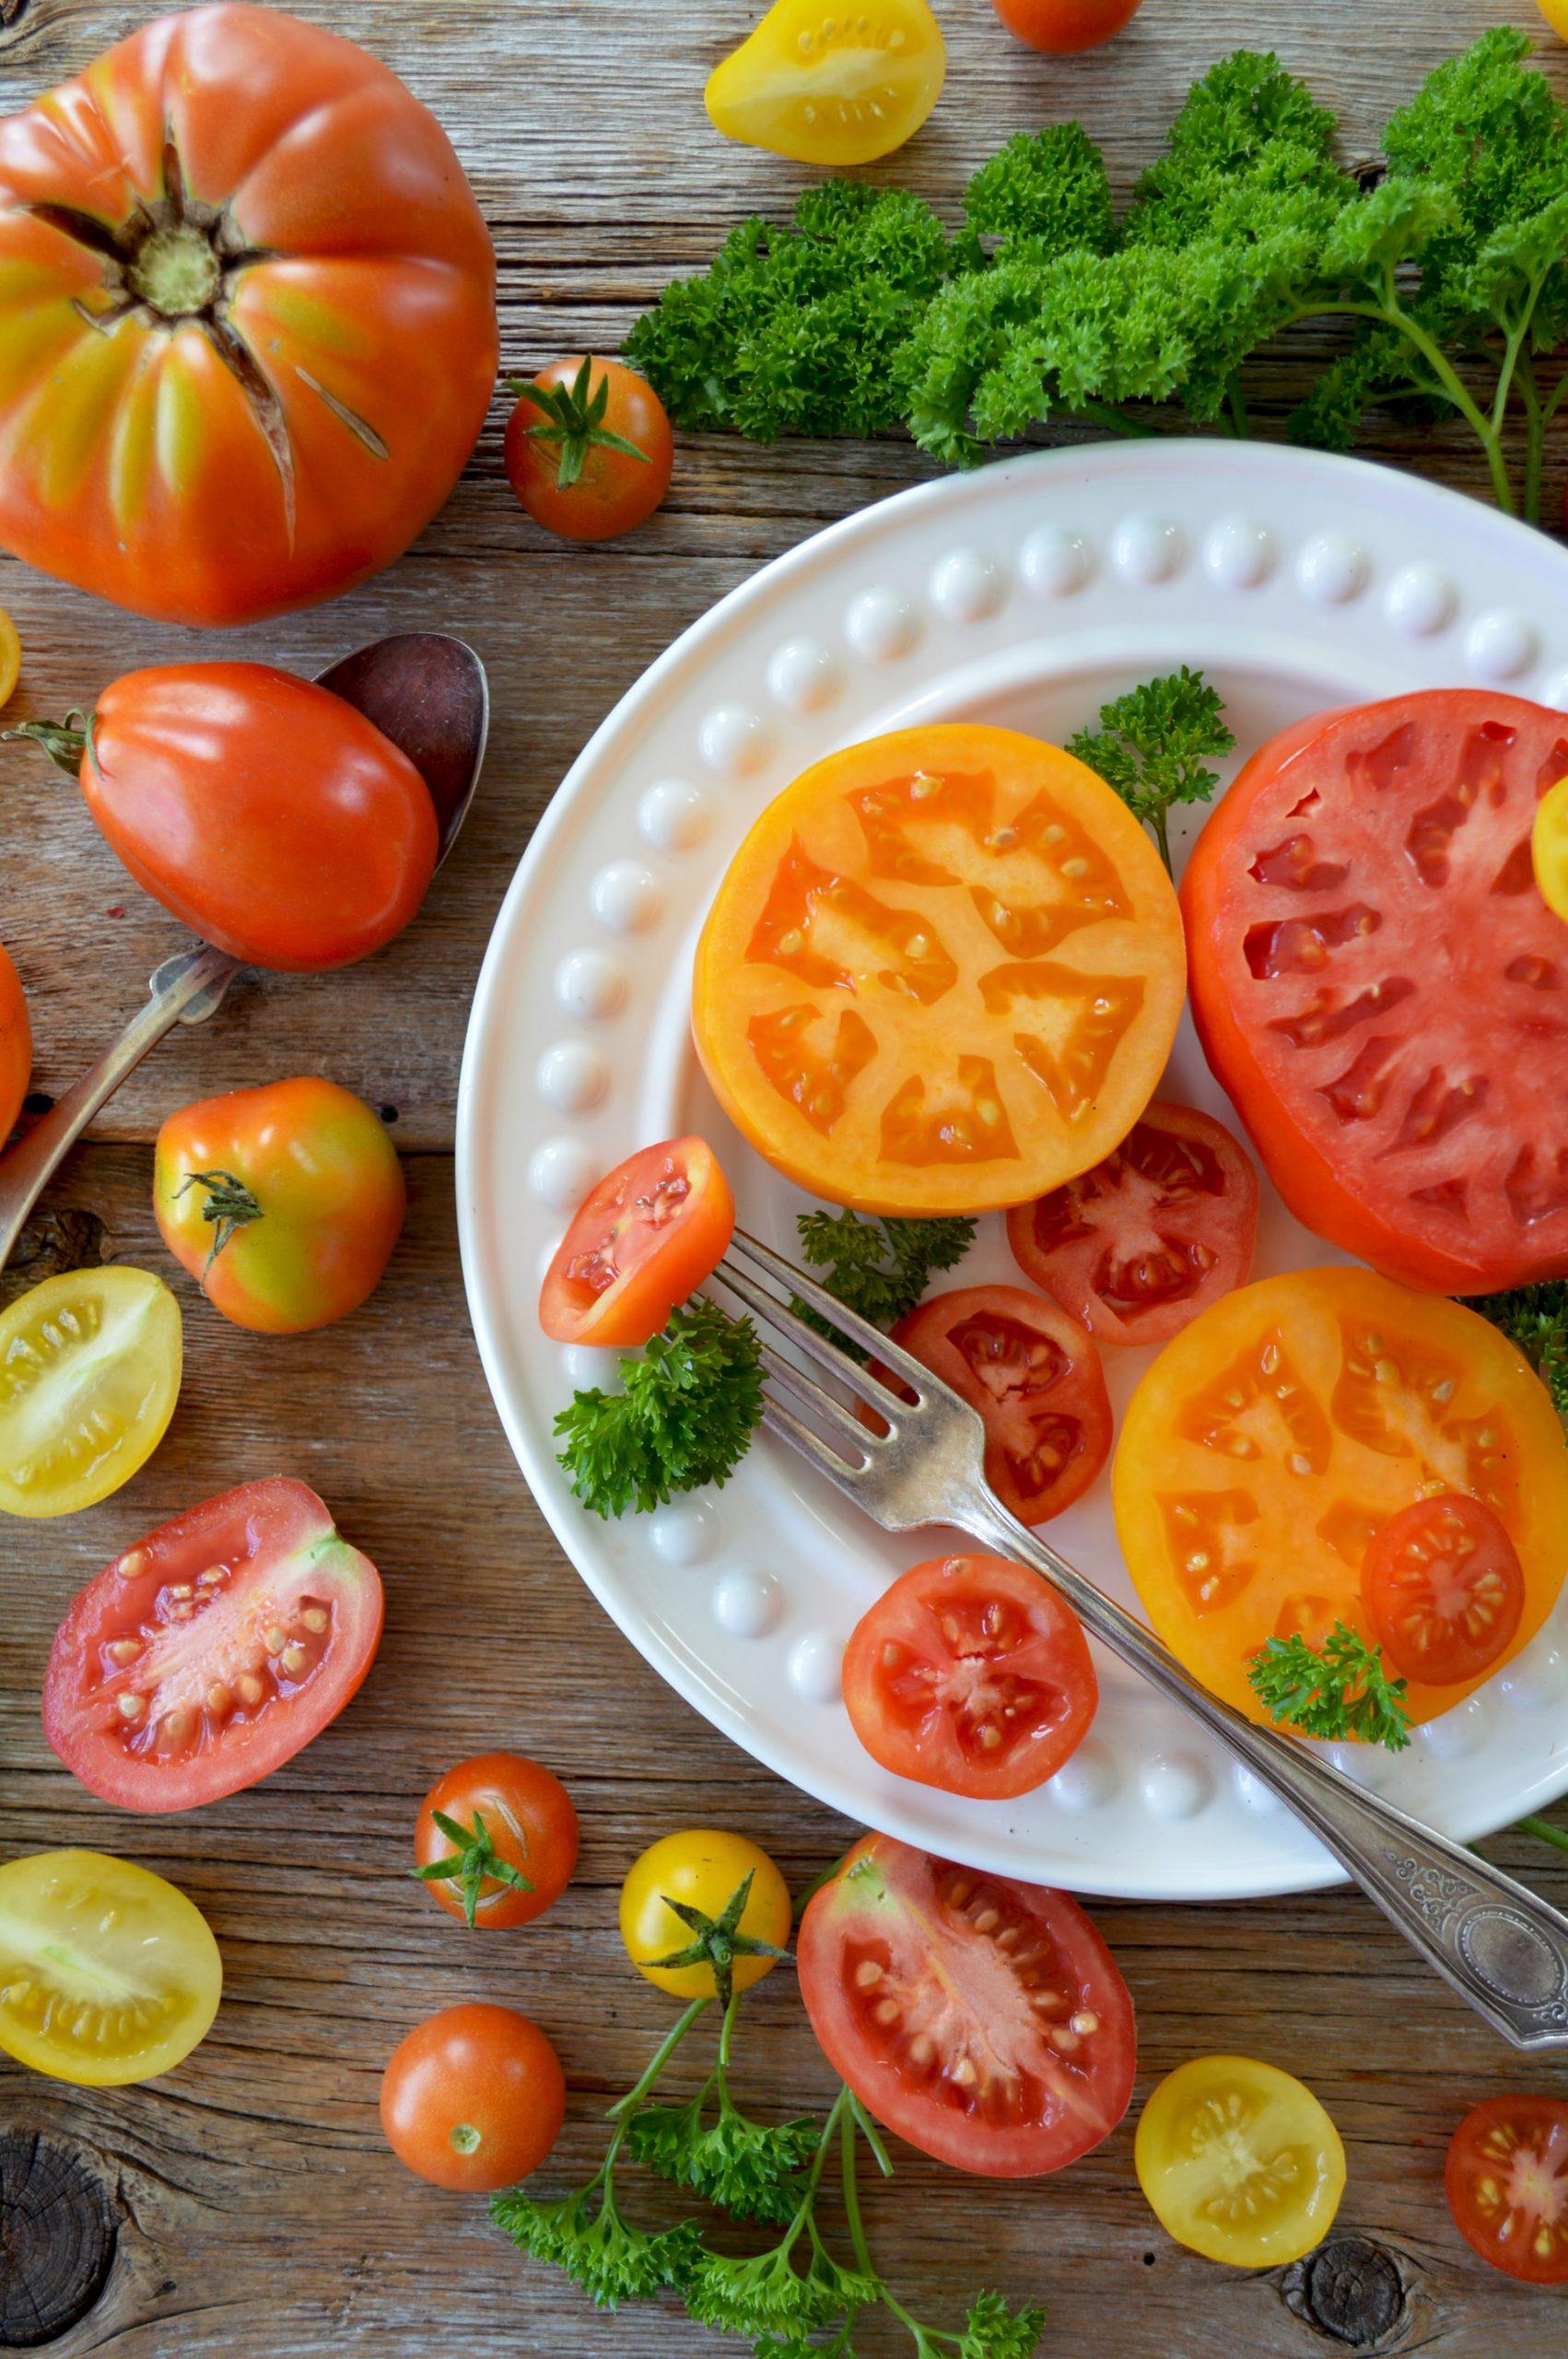 plant-based diet high